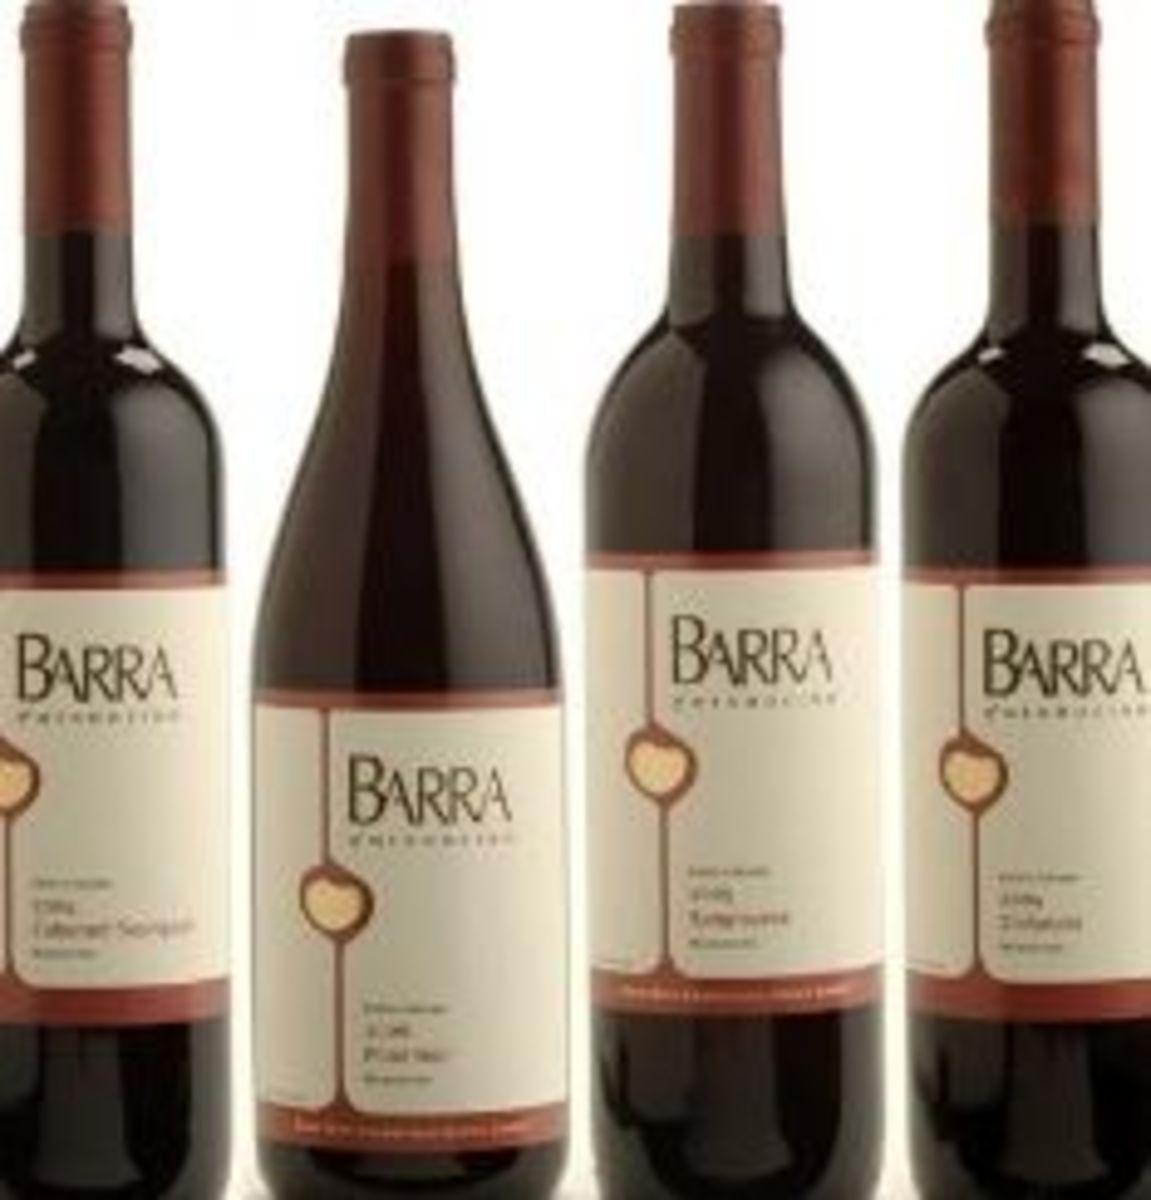 Barra wine